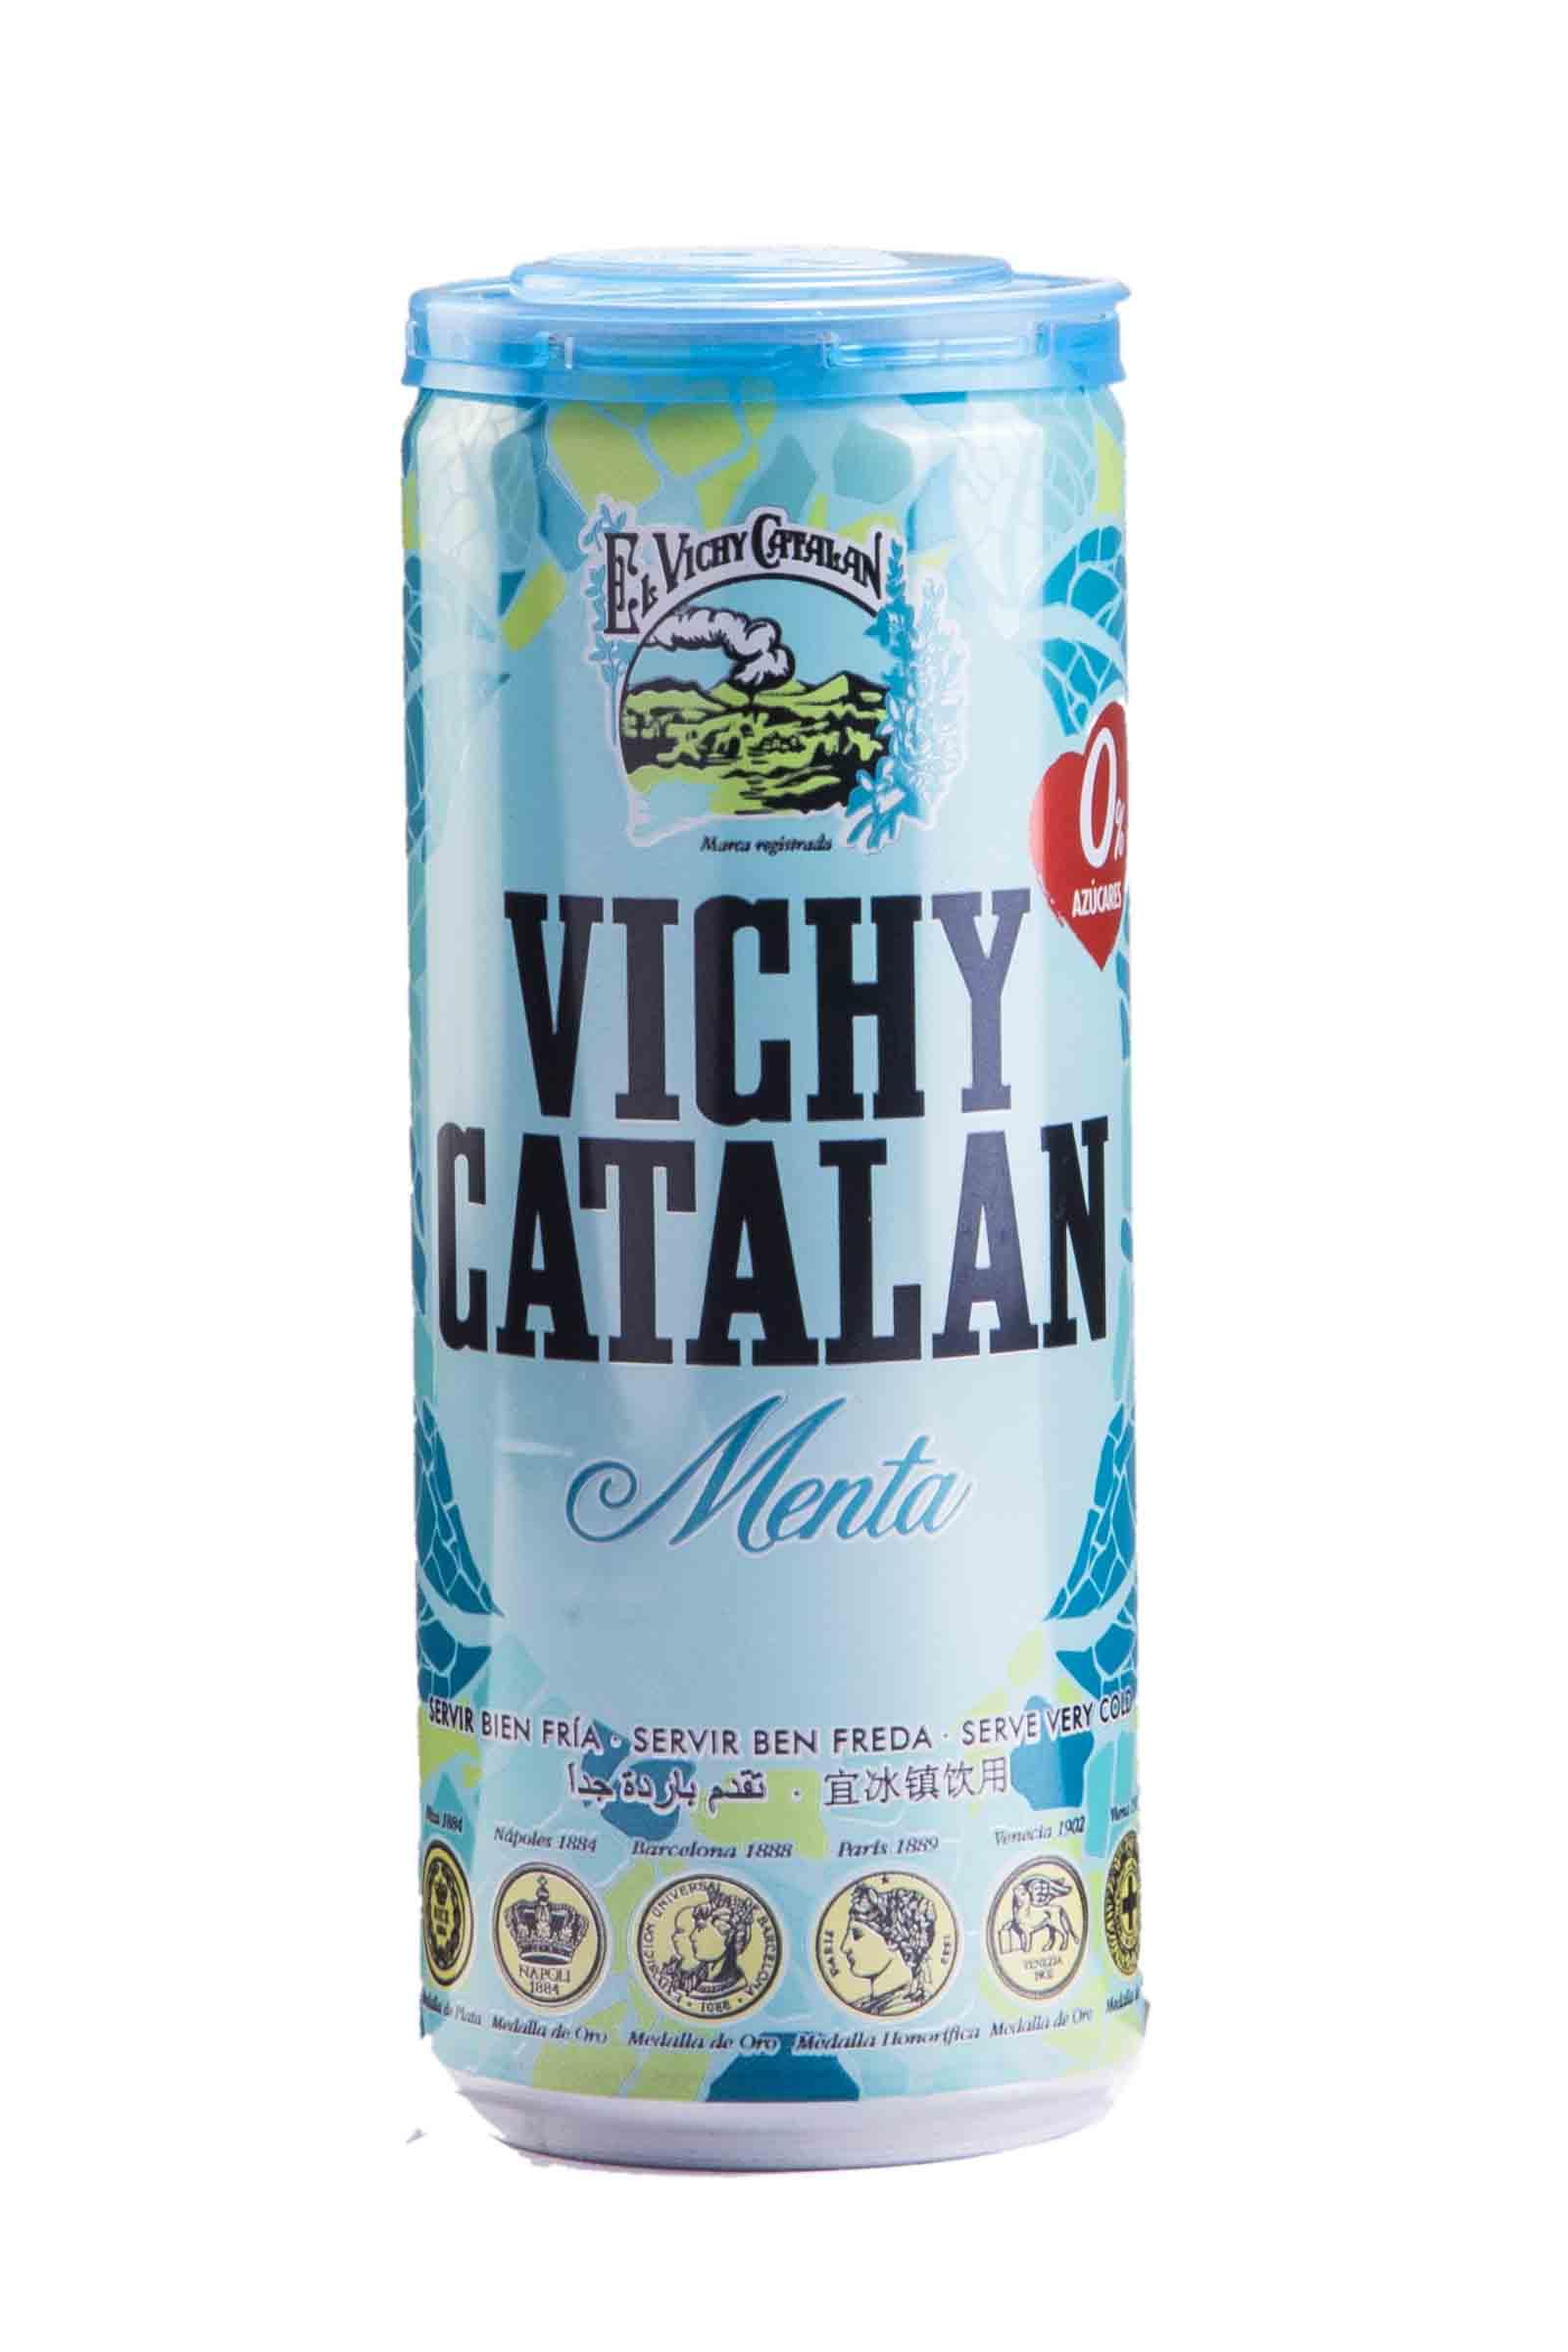 Vichy Catalan Lata Menta 330ml